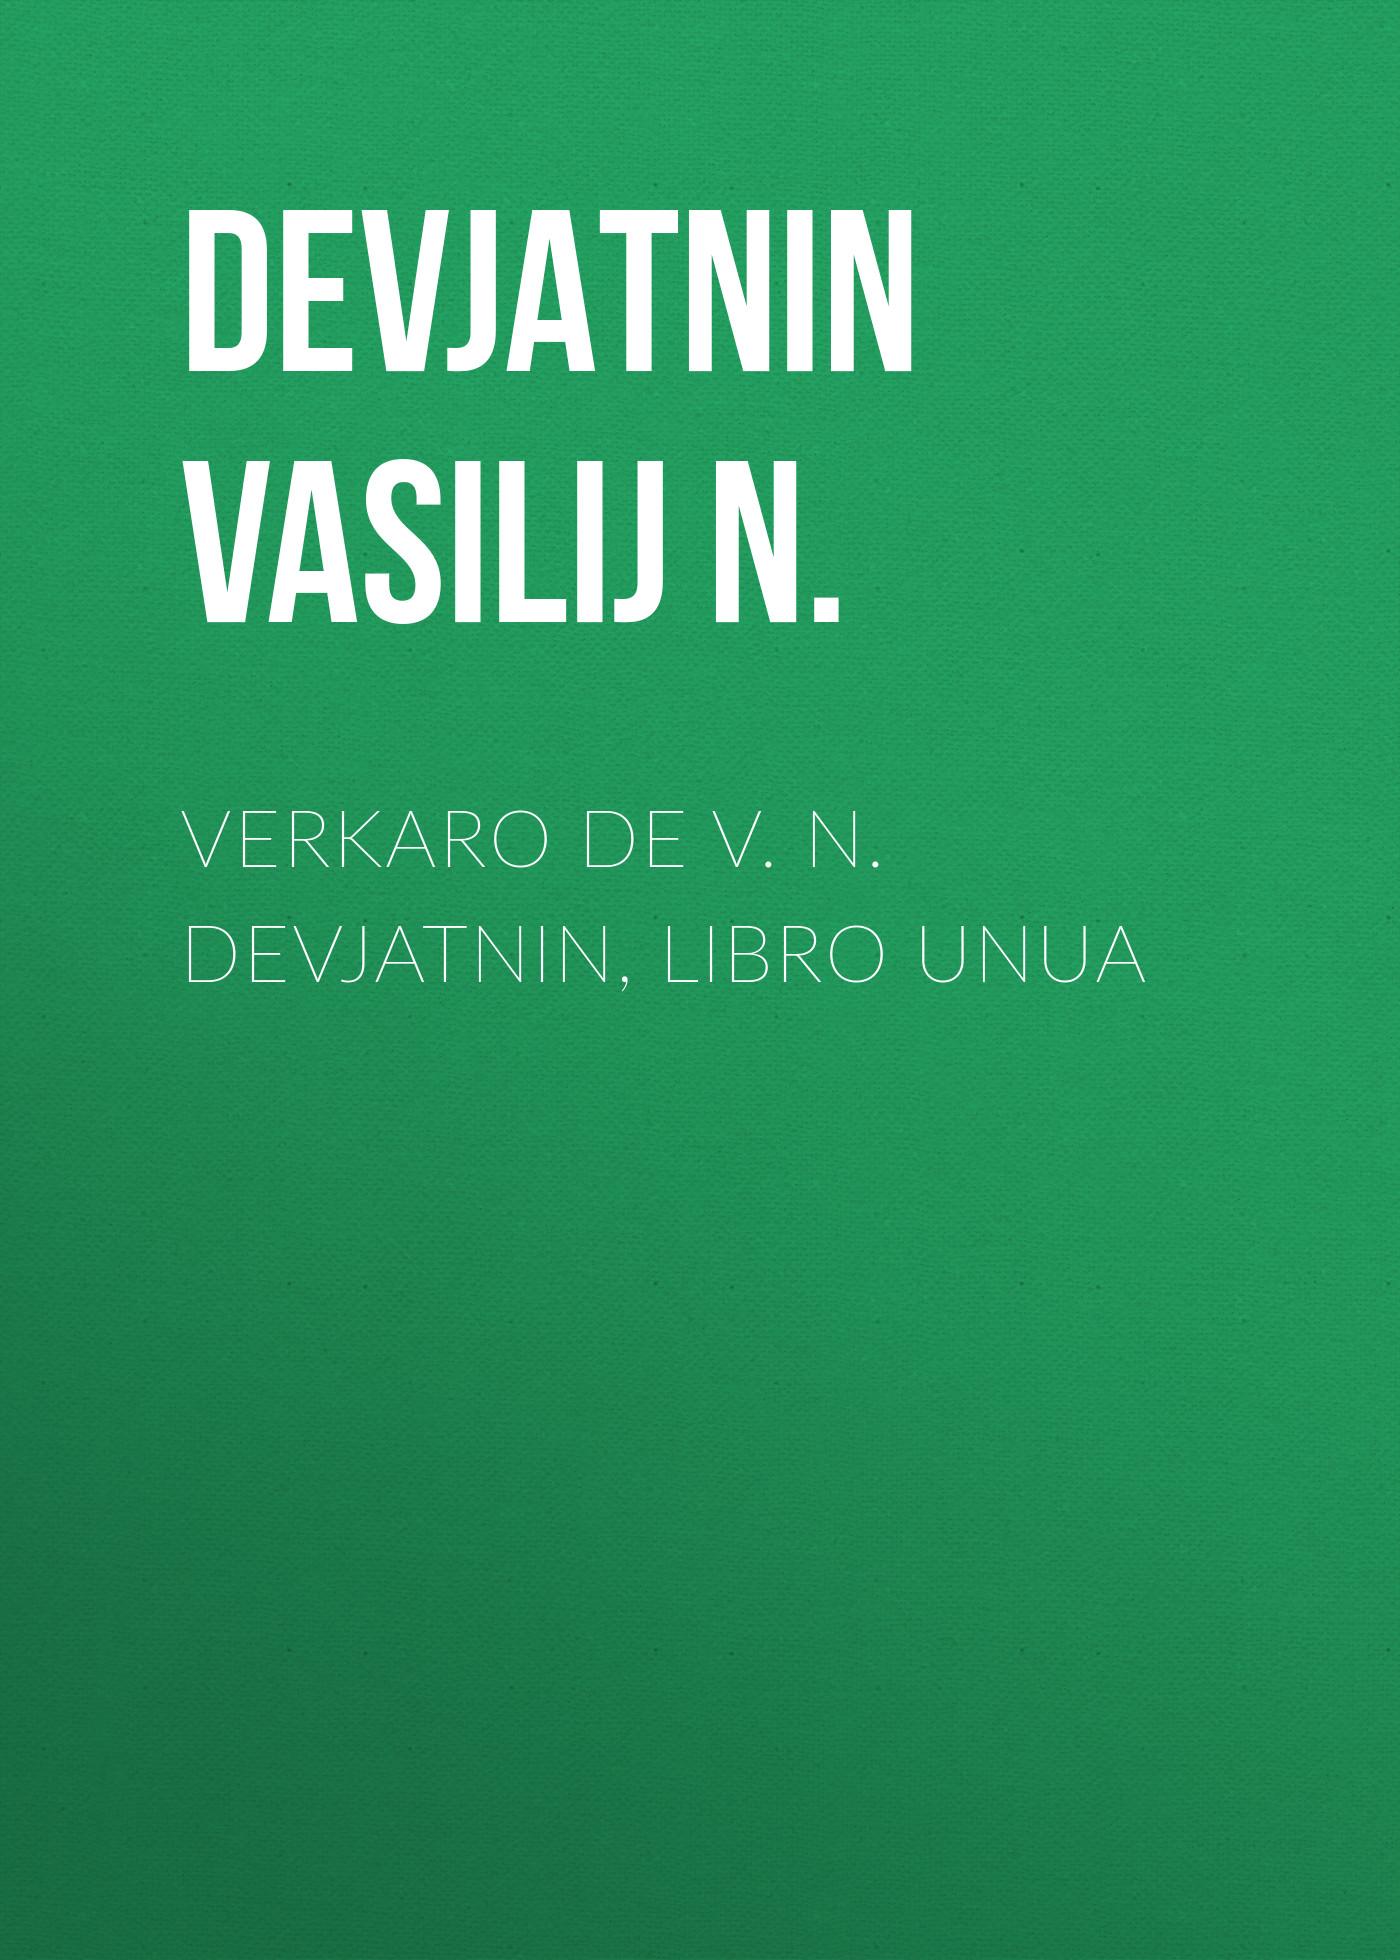 Devjatnin Vasilij N. Verkaro de V. N. Devjatnin, Libro Unua